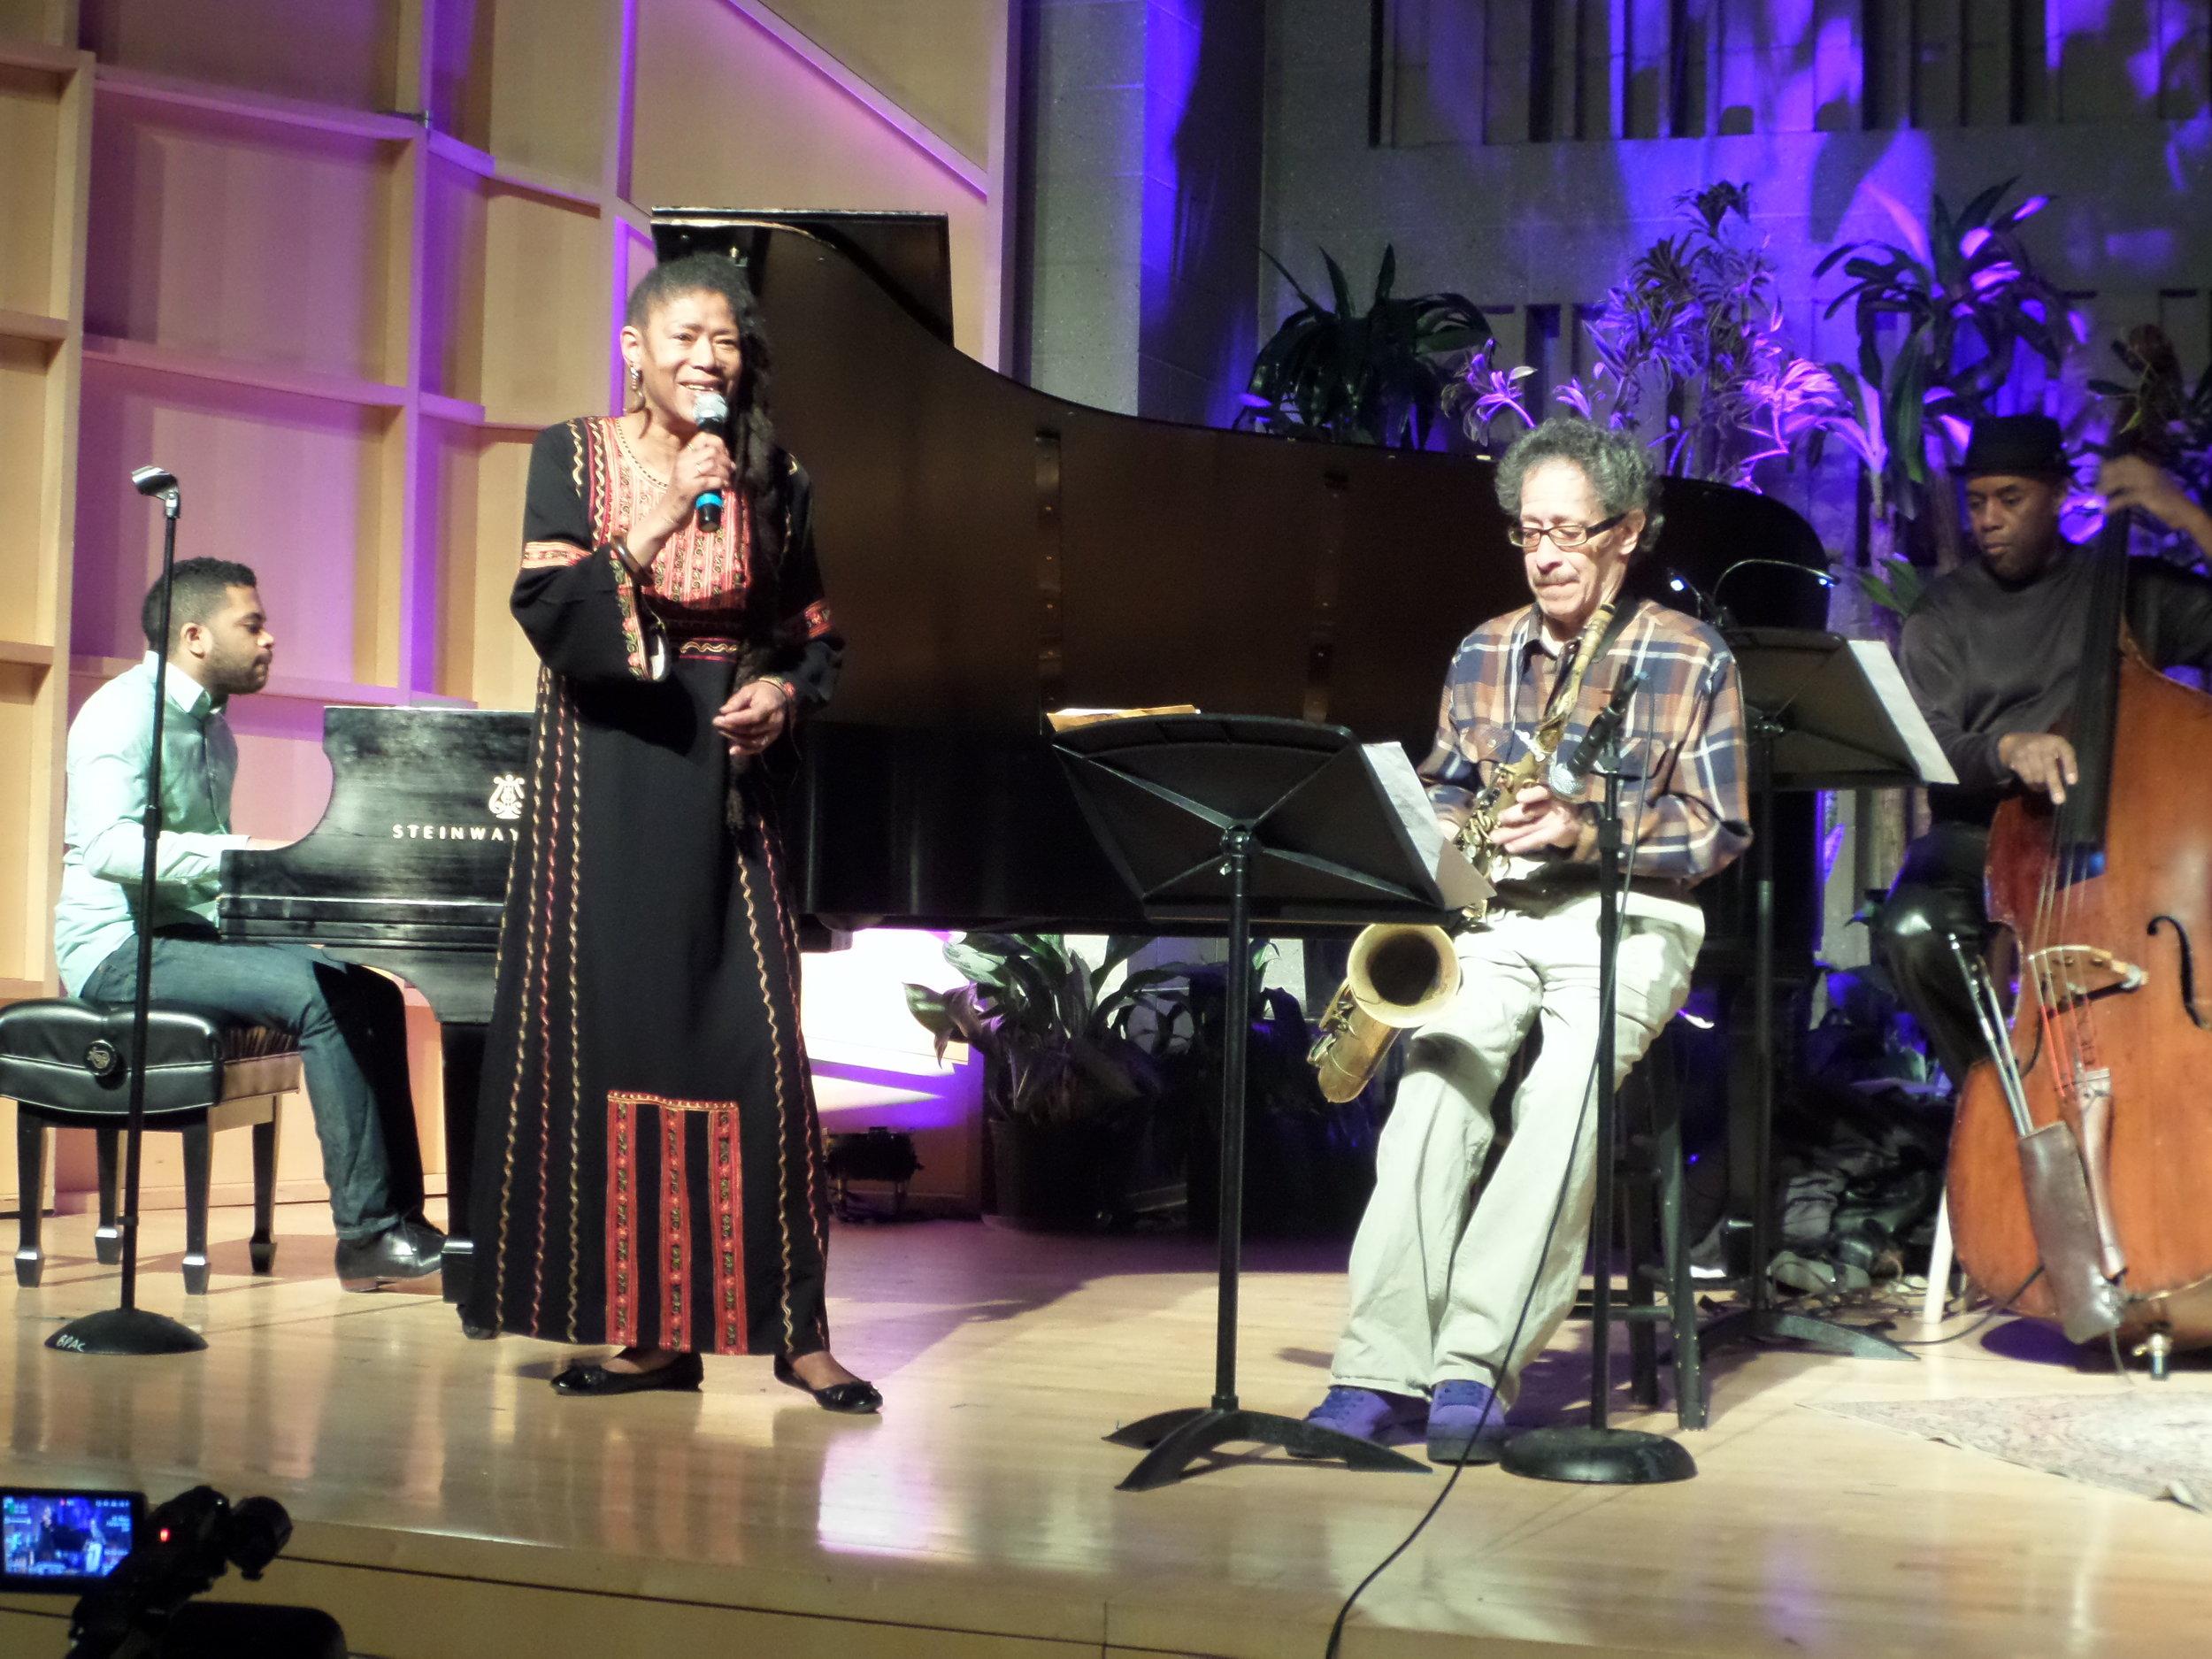 Festival 2015 Opening Night Kick-Off • David Schnitter Jazz Quintet with Vocalist, Marti Mabin.